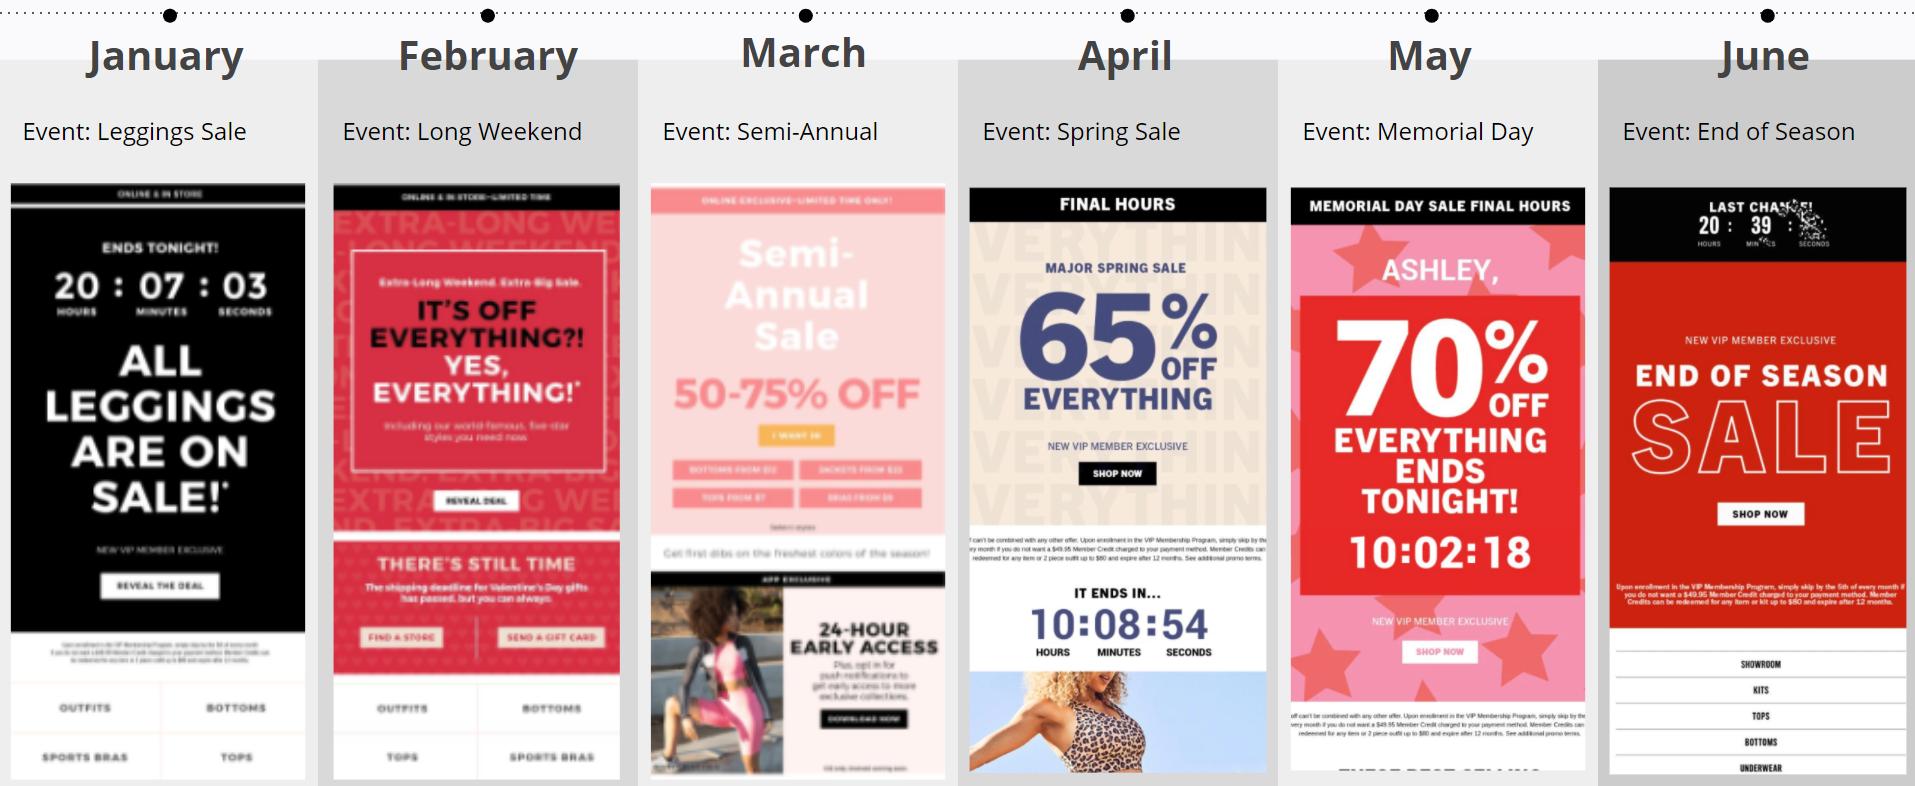 Fabletics - Sale Emails